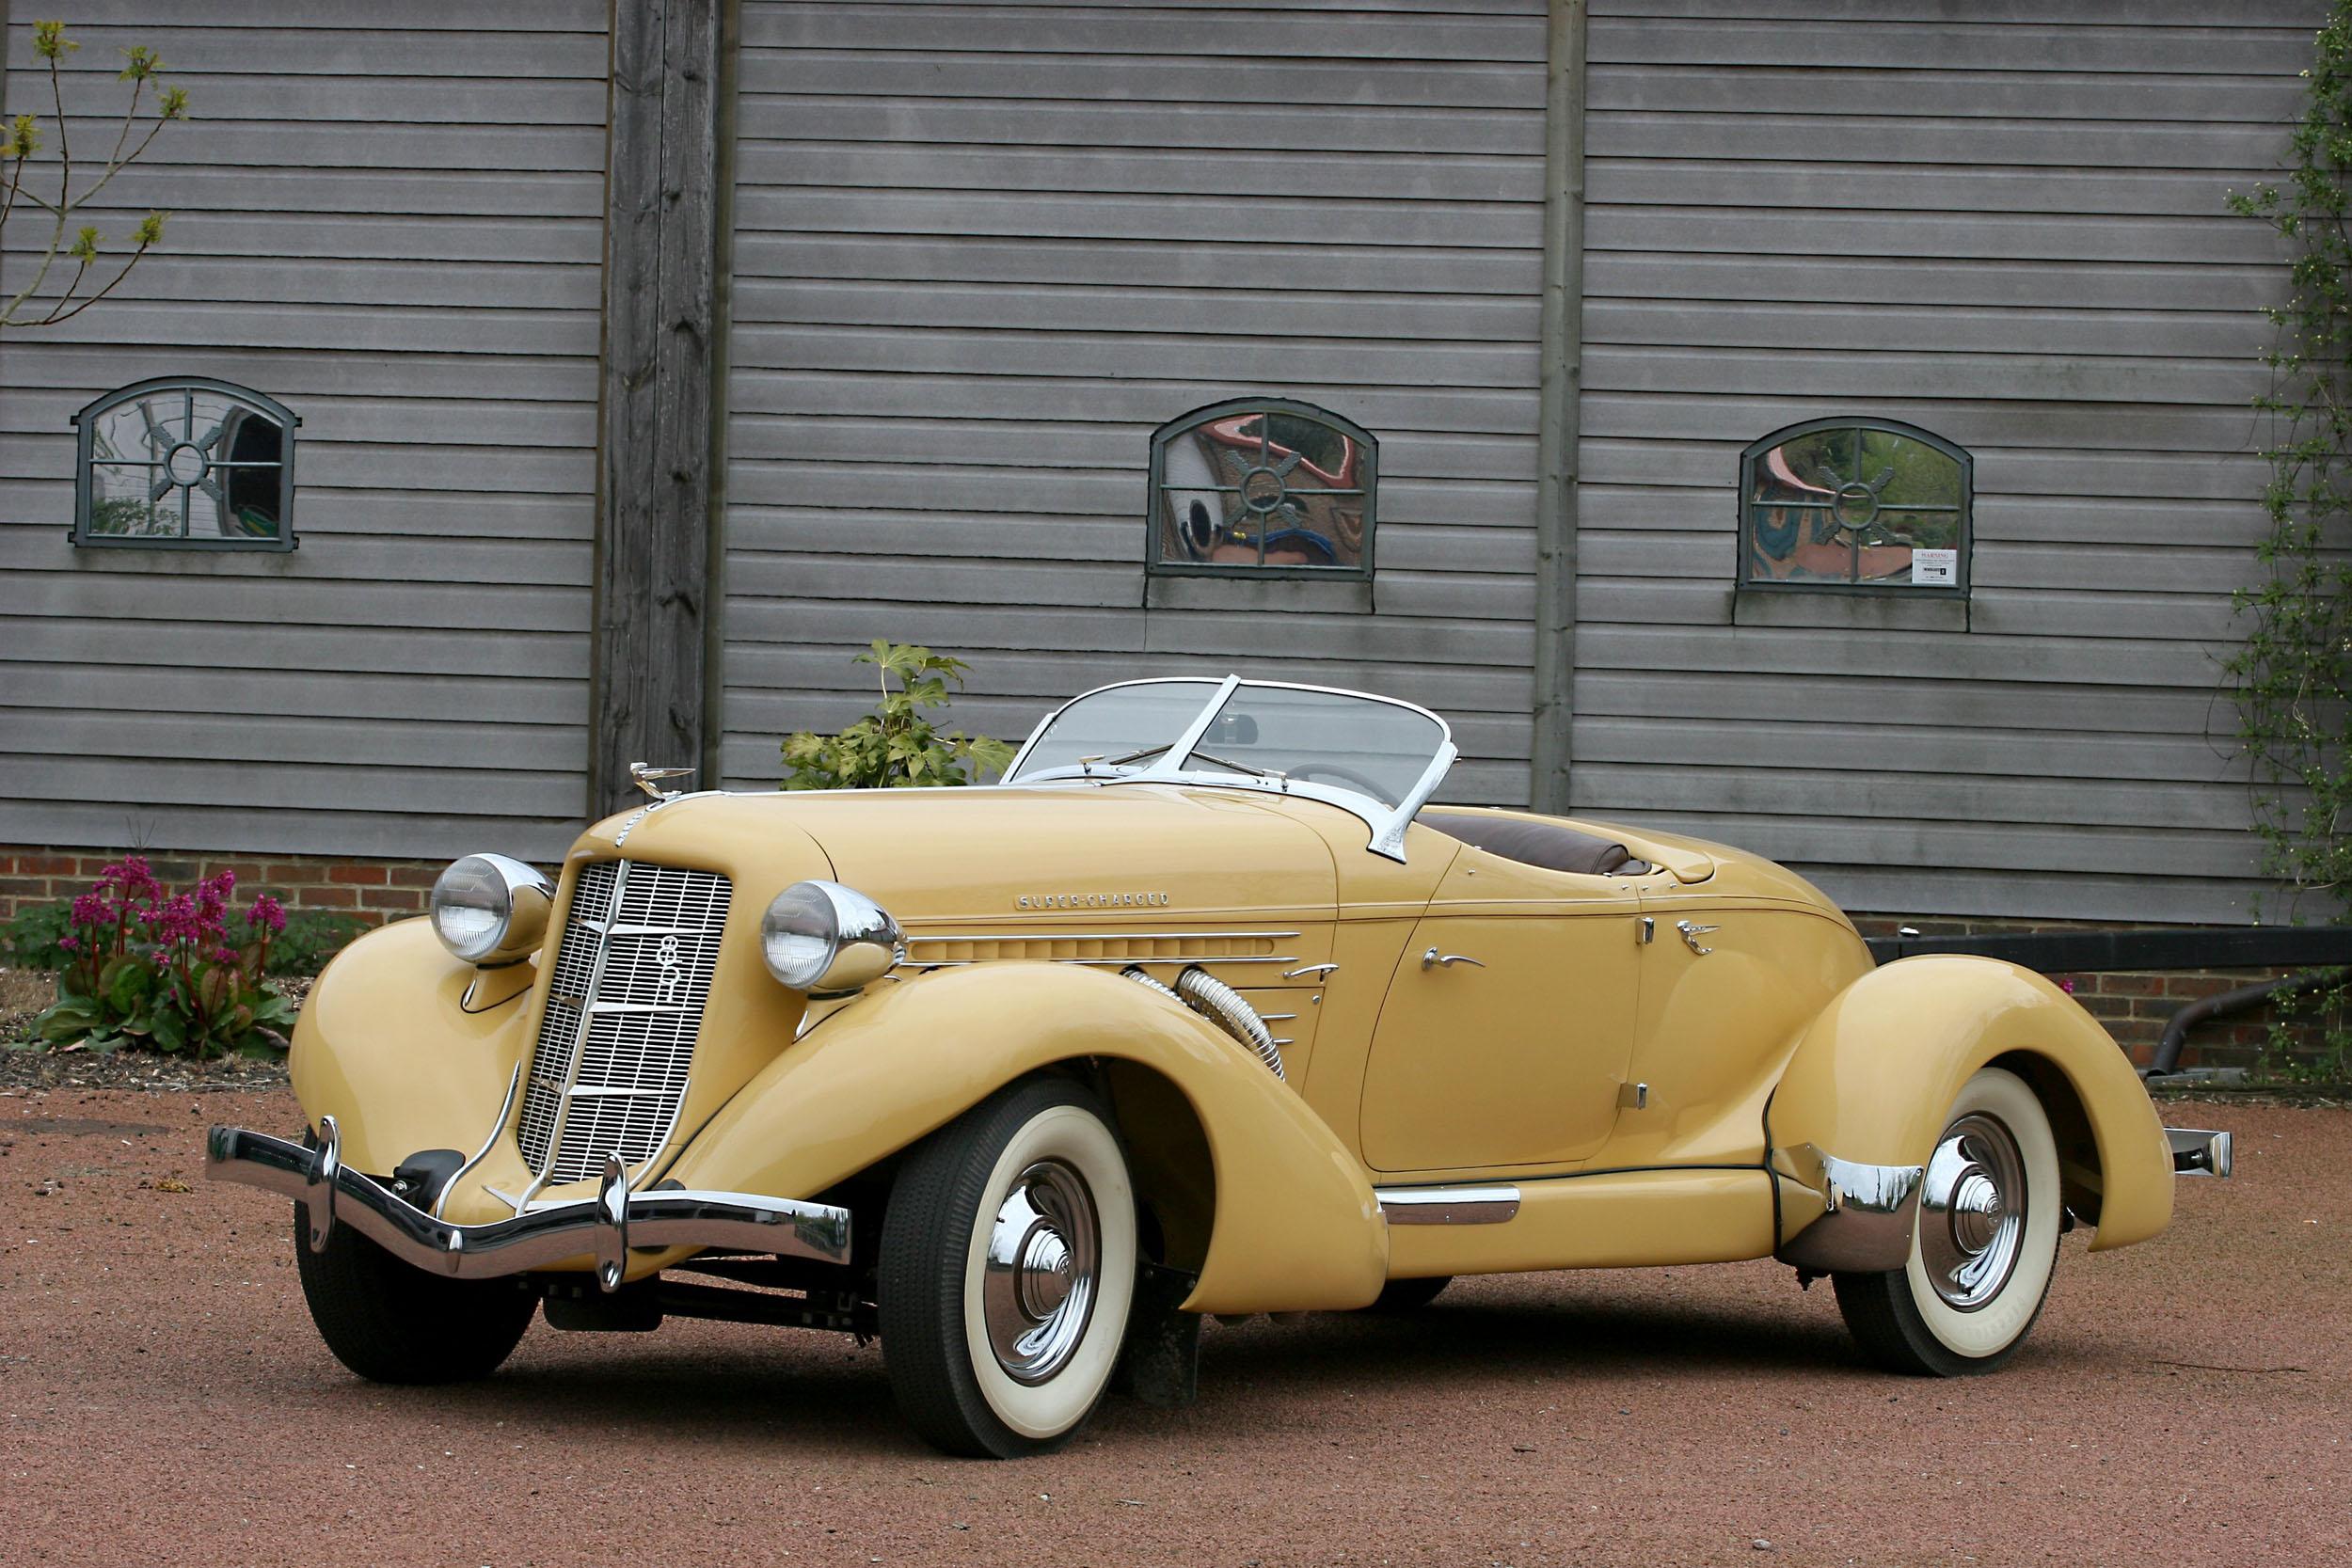 Auburn 851 Speedster, 1934